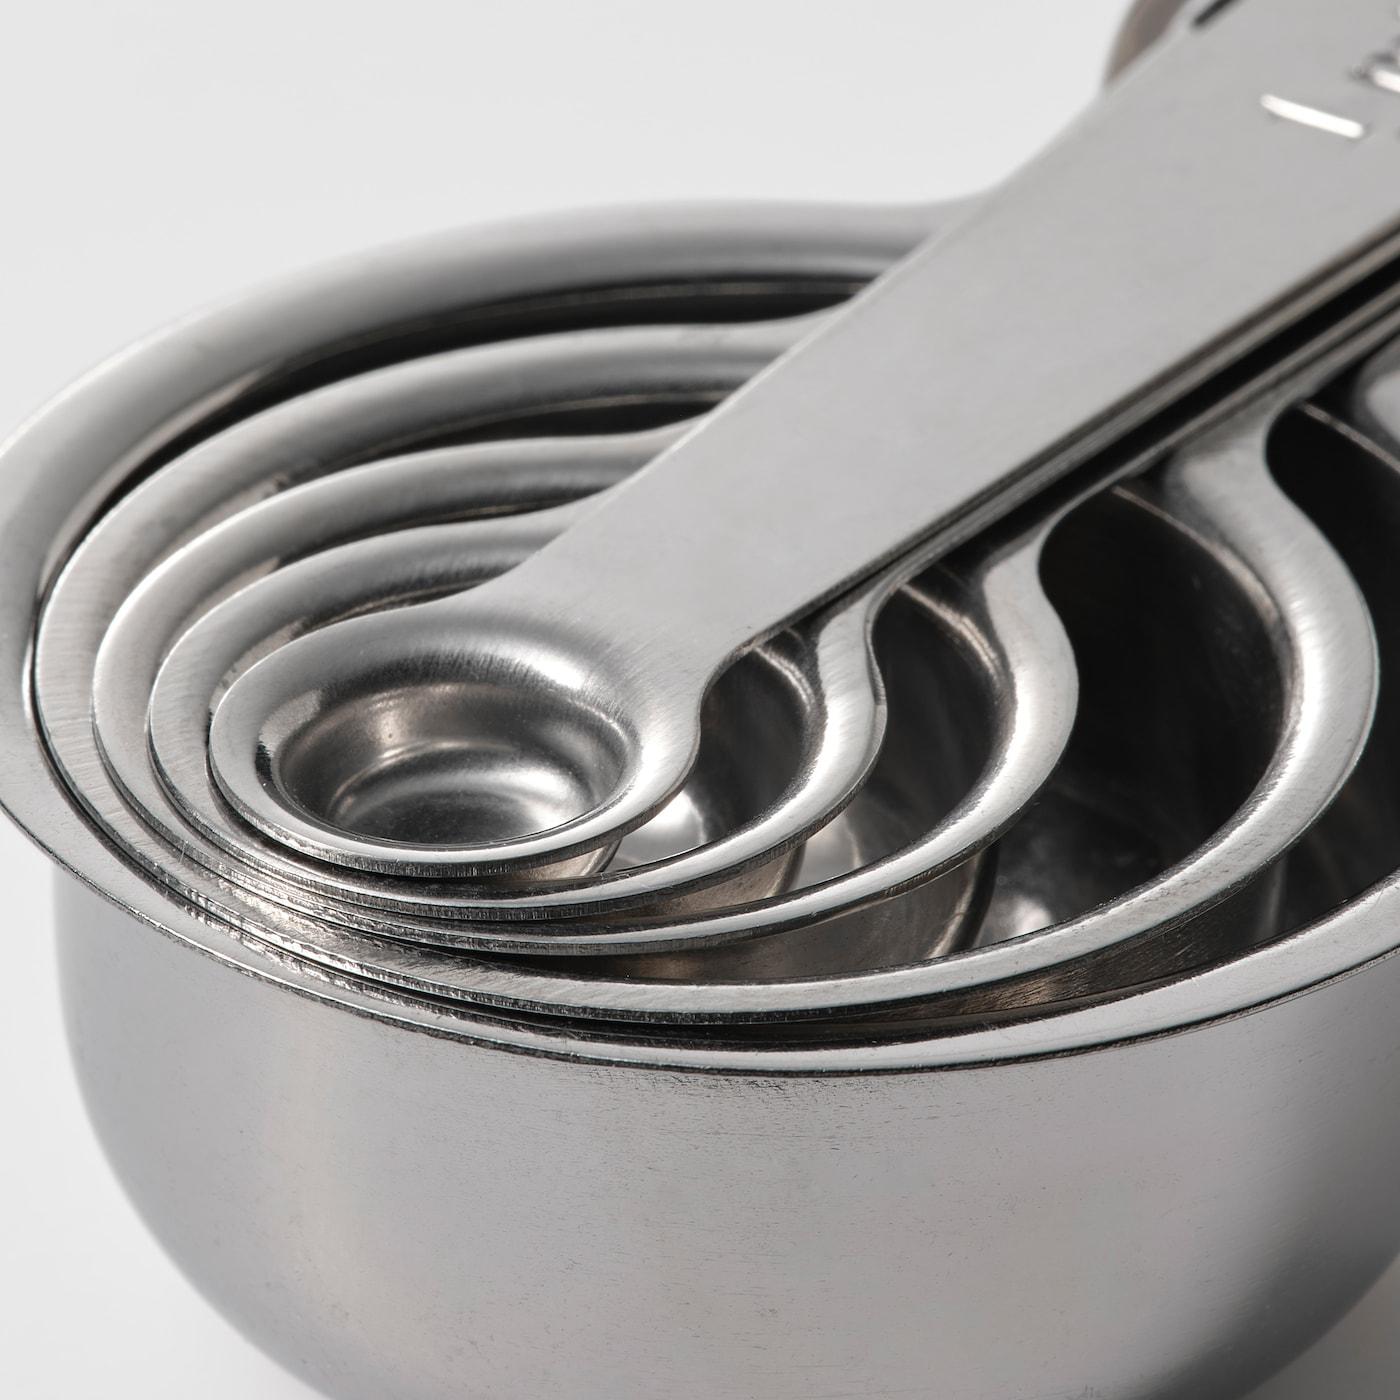 VARDAGEN Measuring cup, set of 5